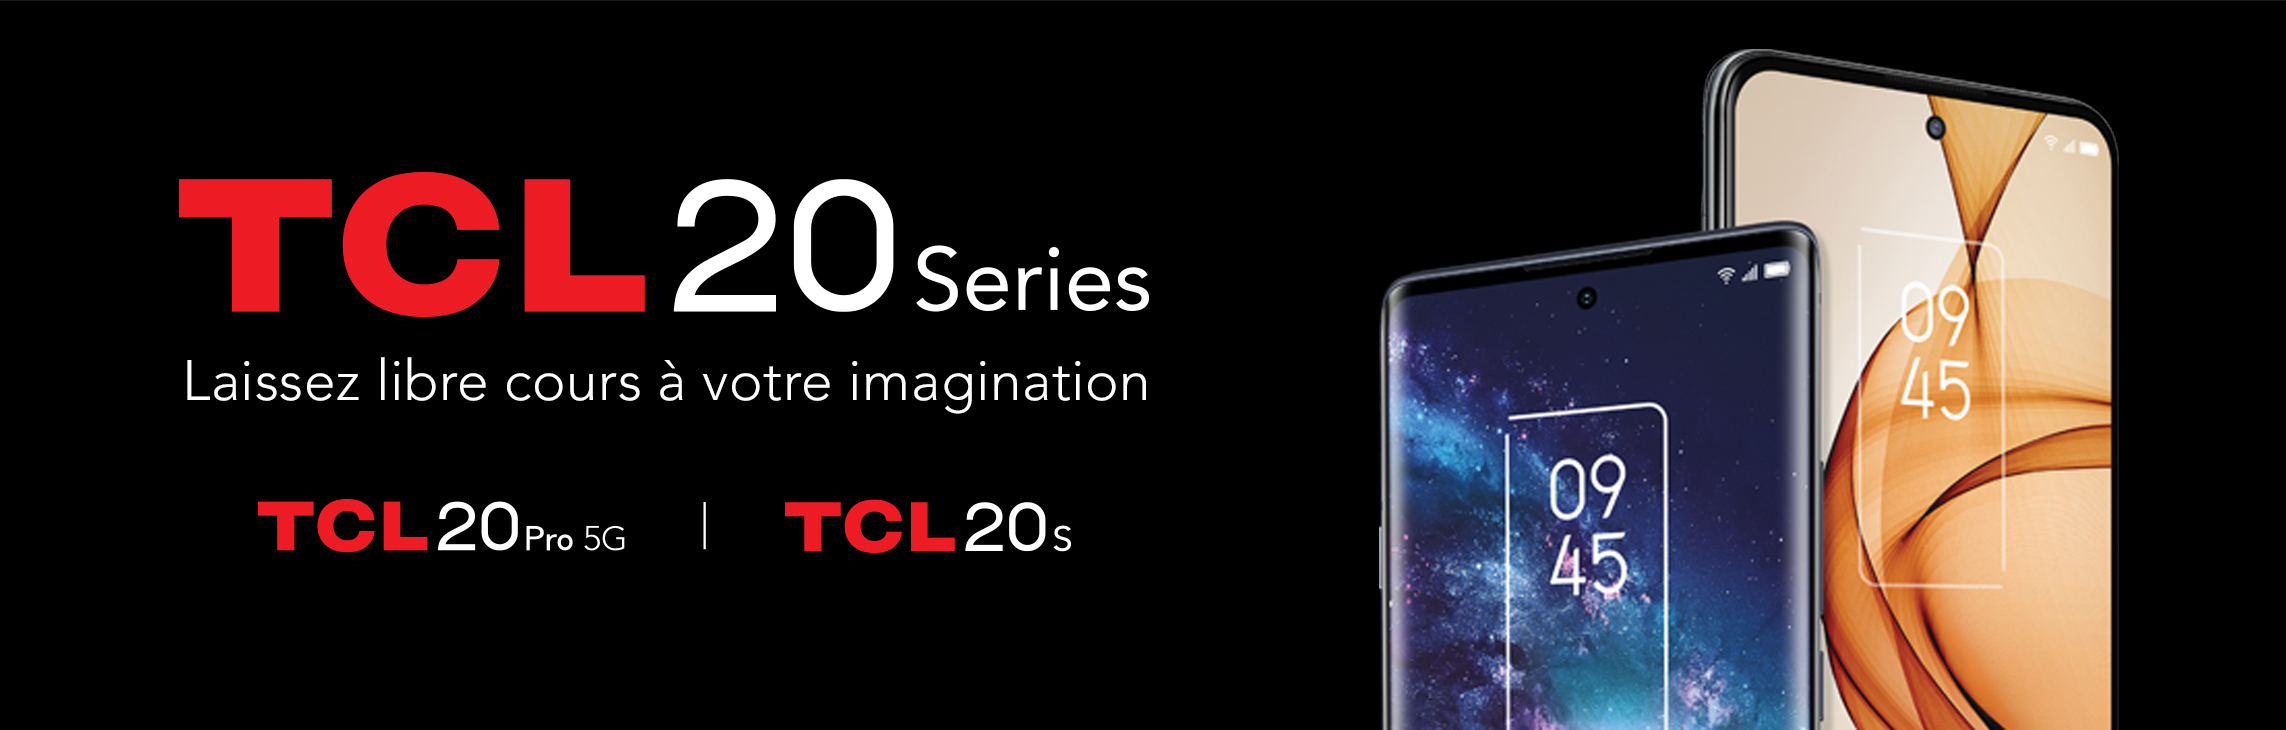 TCL 20 Series - FR